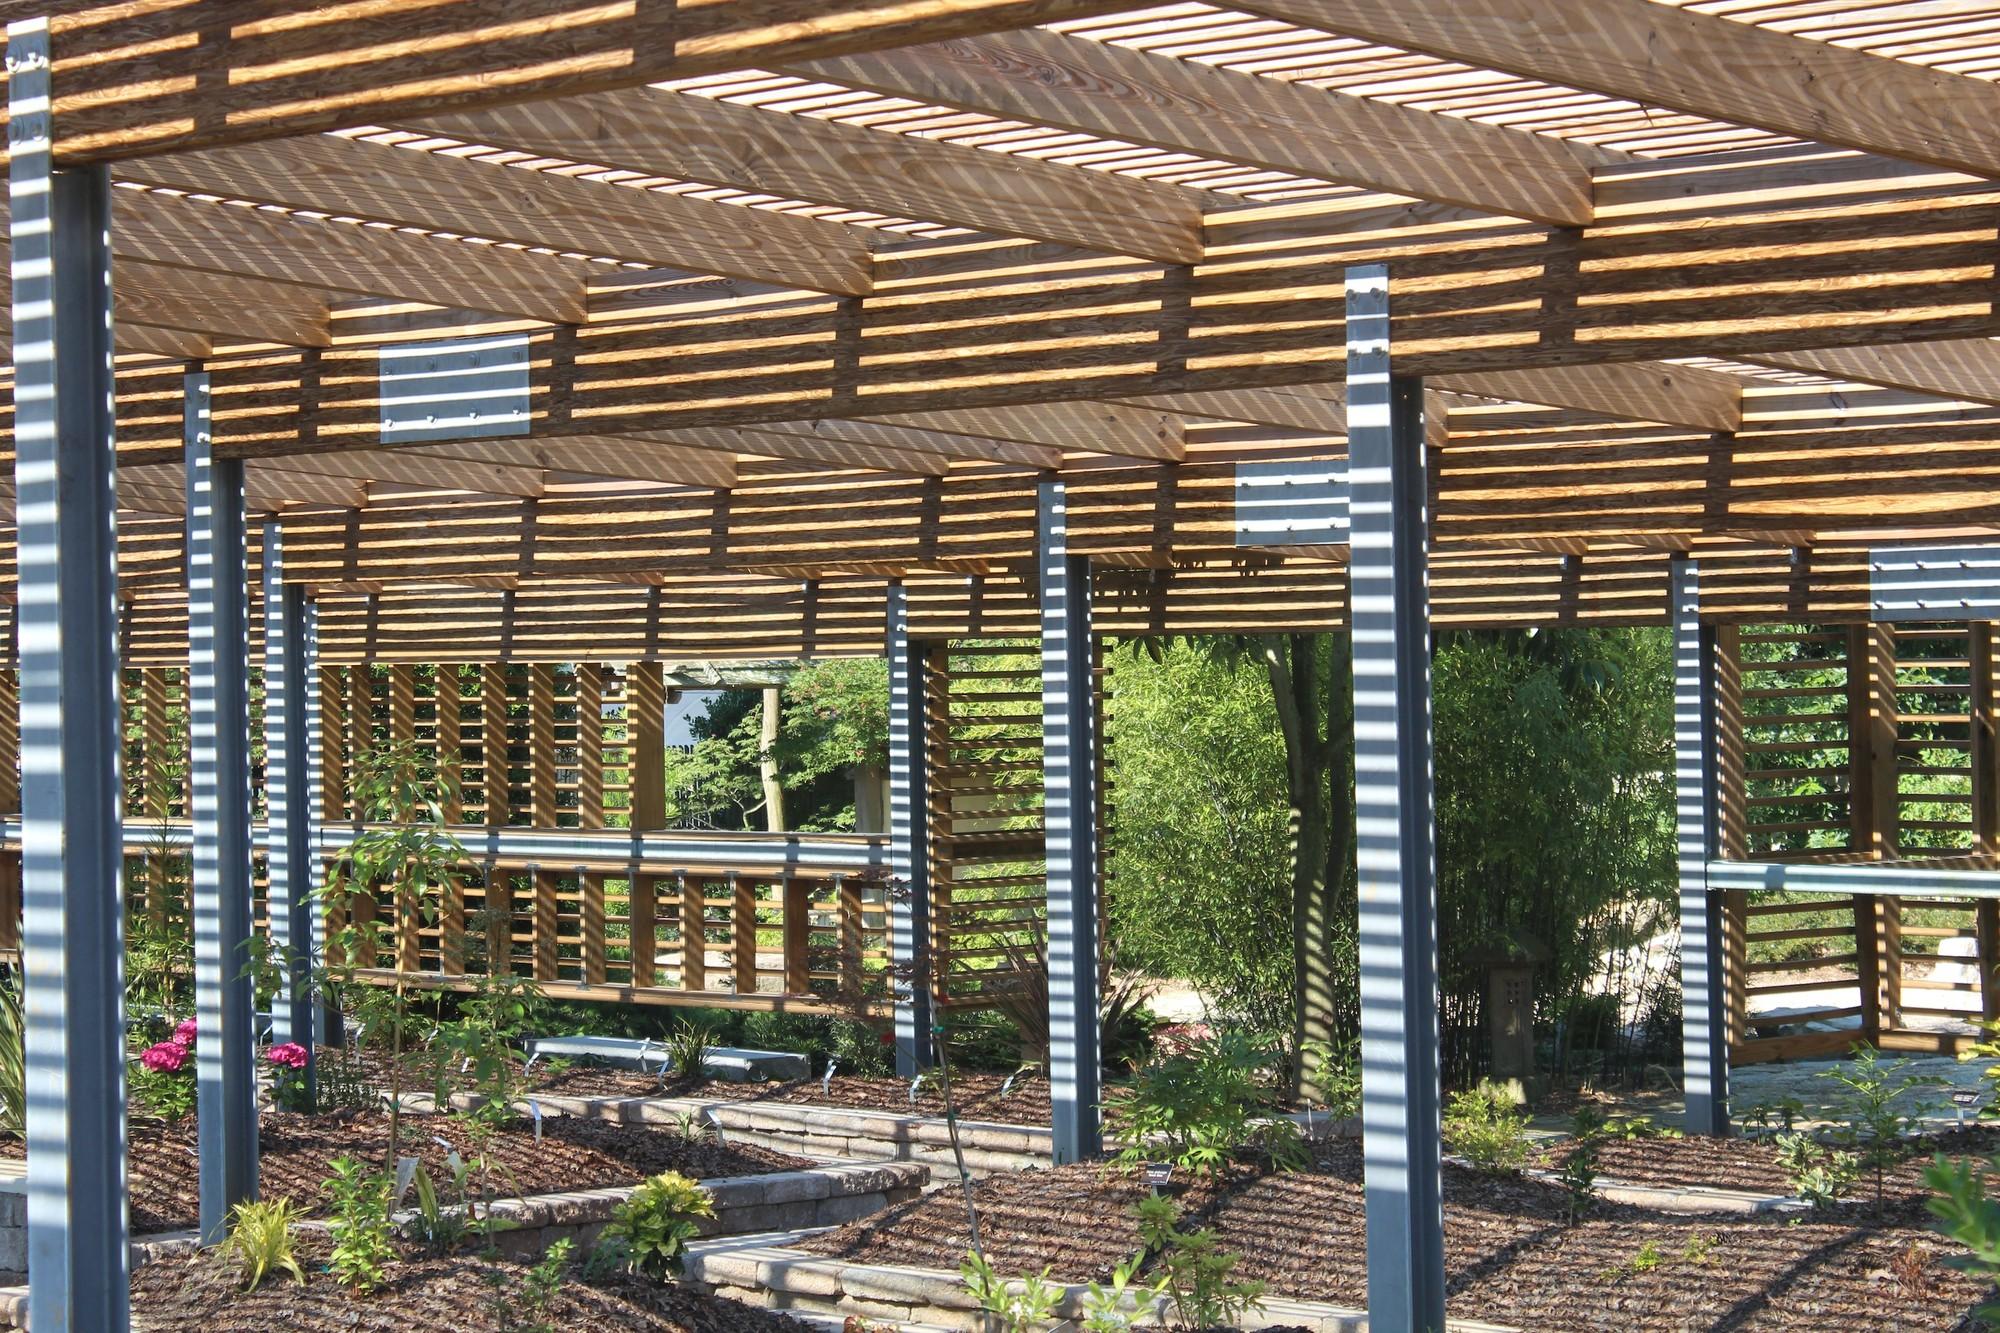 Gallery of JC Raulston Arboretum Lath House / Frank Harmon Architect on hvac house plans, hampton house plans, garden house plans,